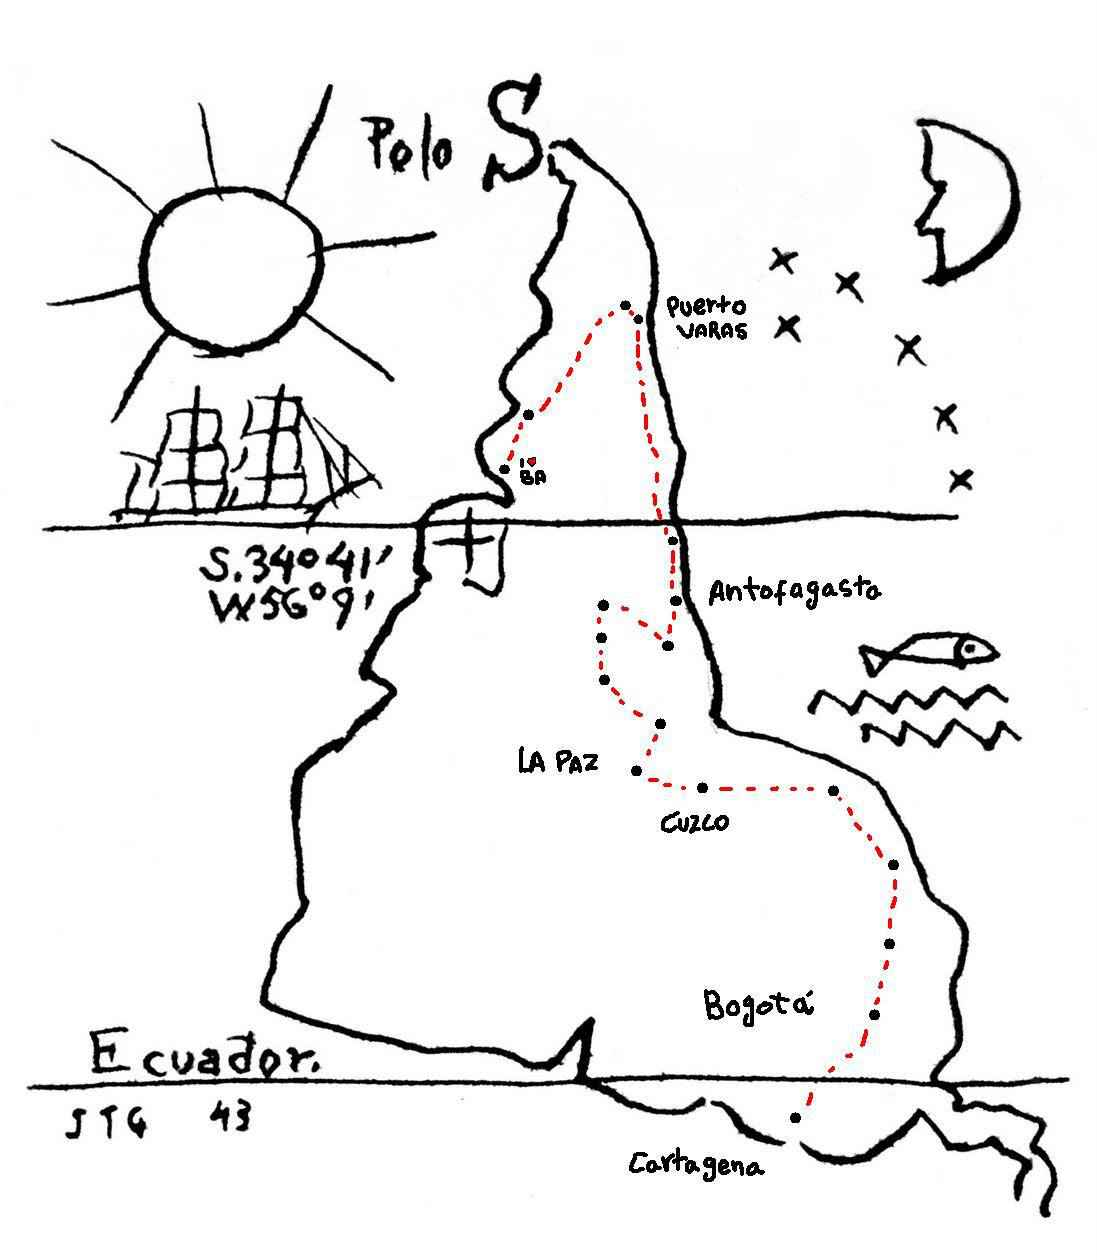 Mapa invertido, idealizado pelo pintor uruguaio Joaquín Torres García: importância de olhar a América de uma outra maneira